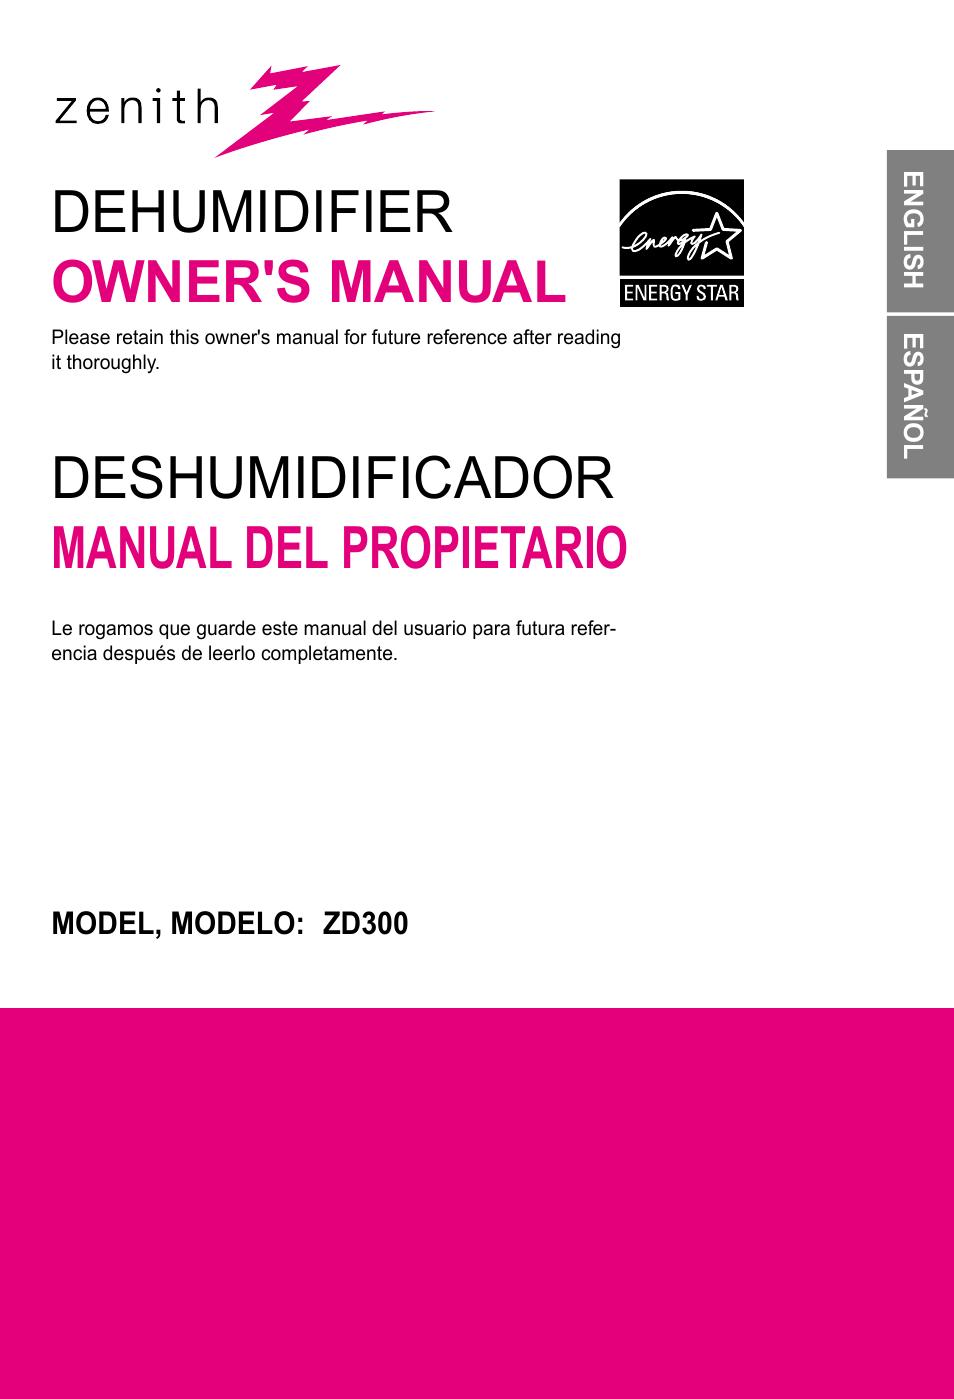 lg zd300 user manual 32 pages rh manualsdir com zenith humidifier manual zenith humidifier manual